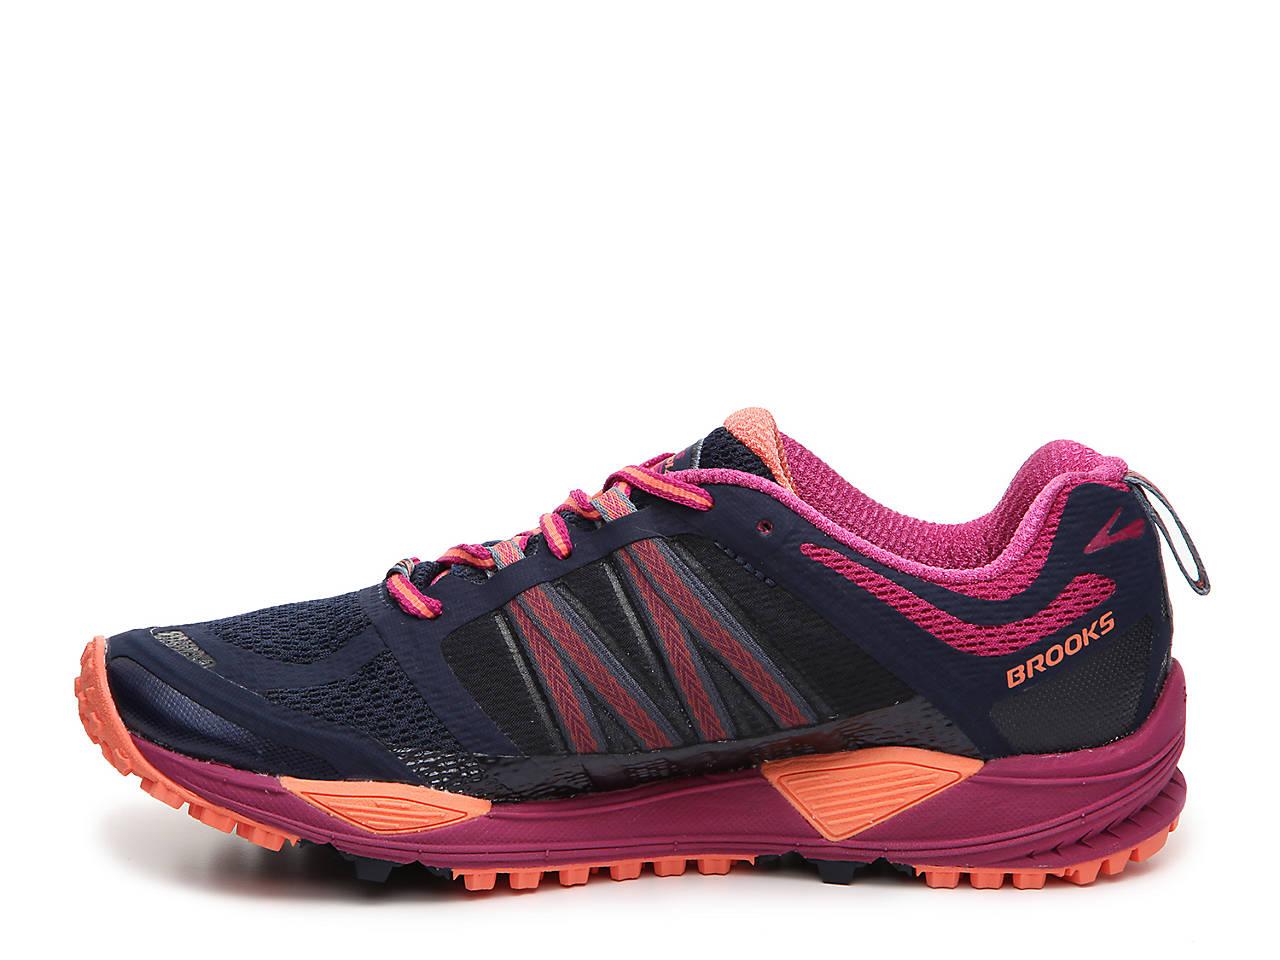 605a35fa678 Brooks Cascadia 11 Performance Trail Running Shoe - Women s Women s ...